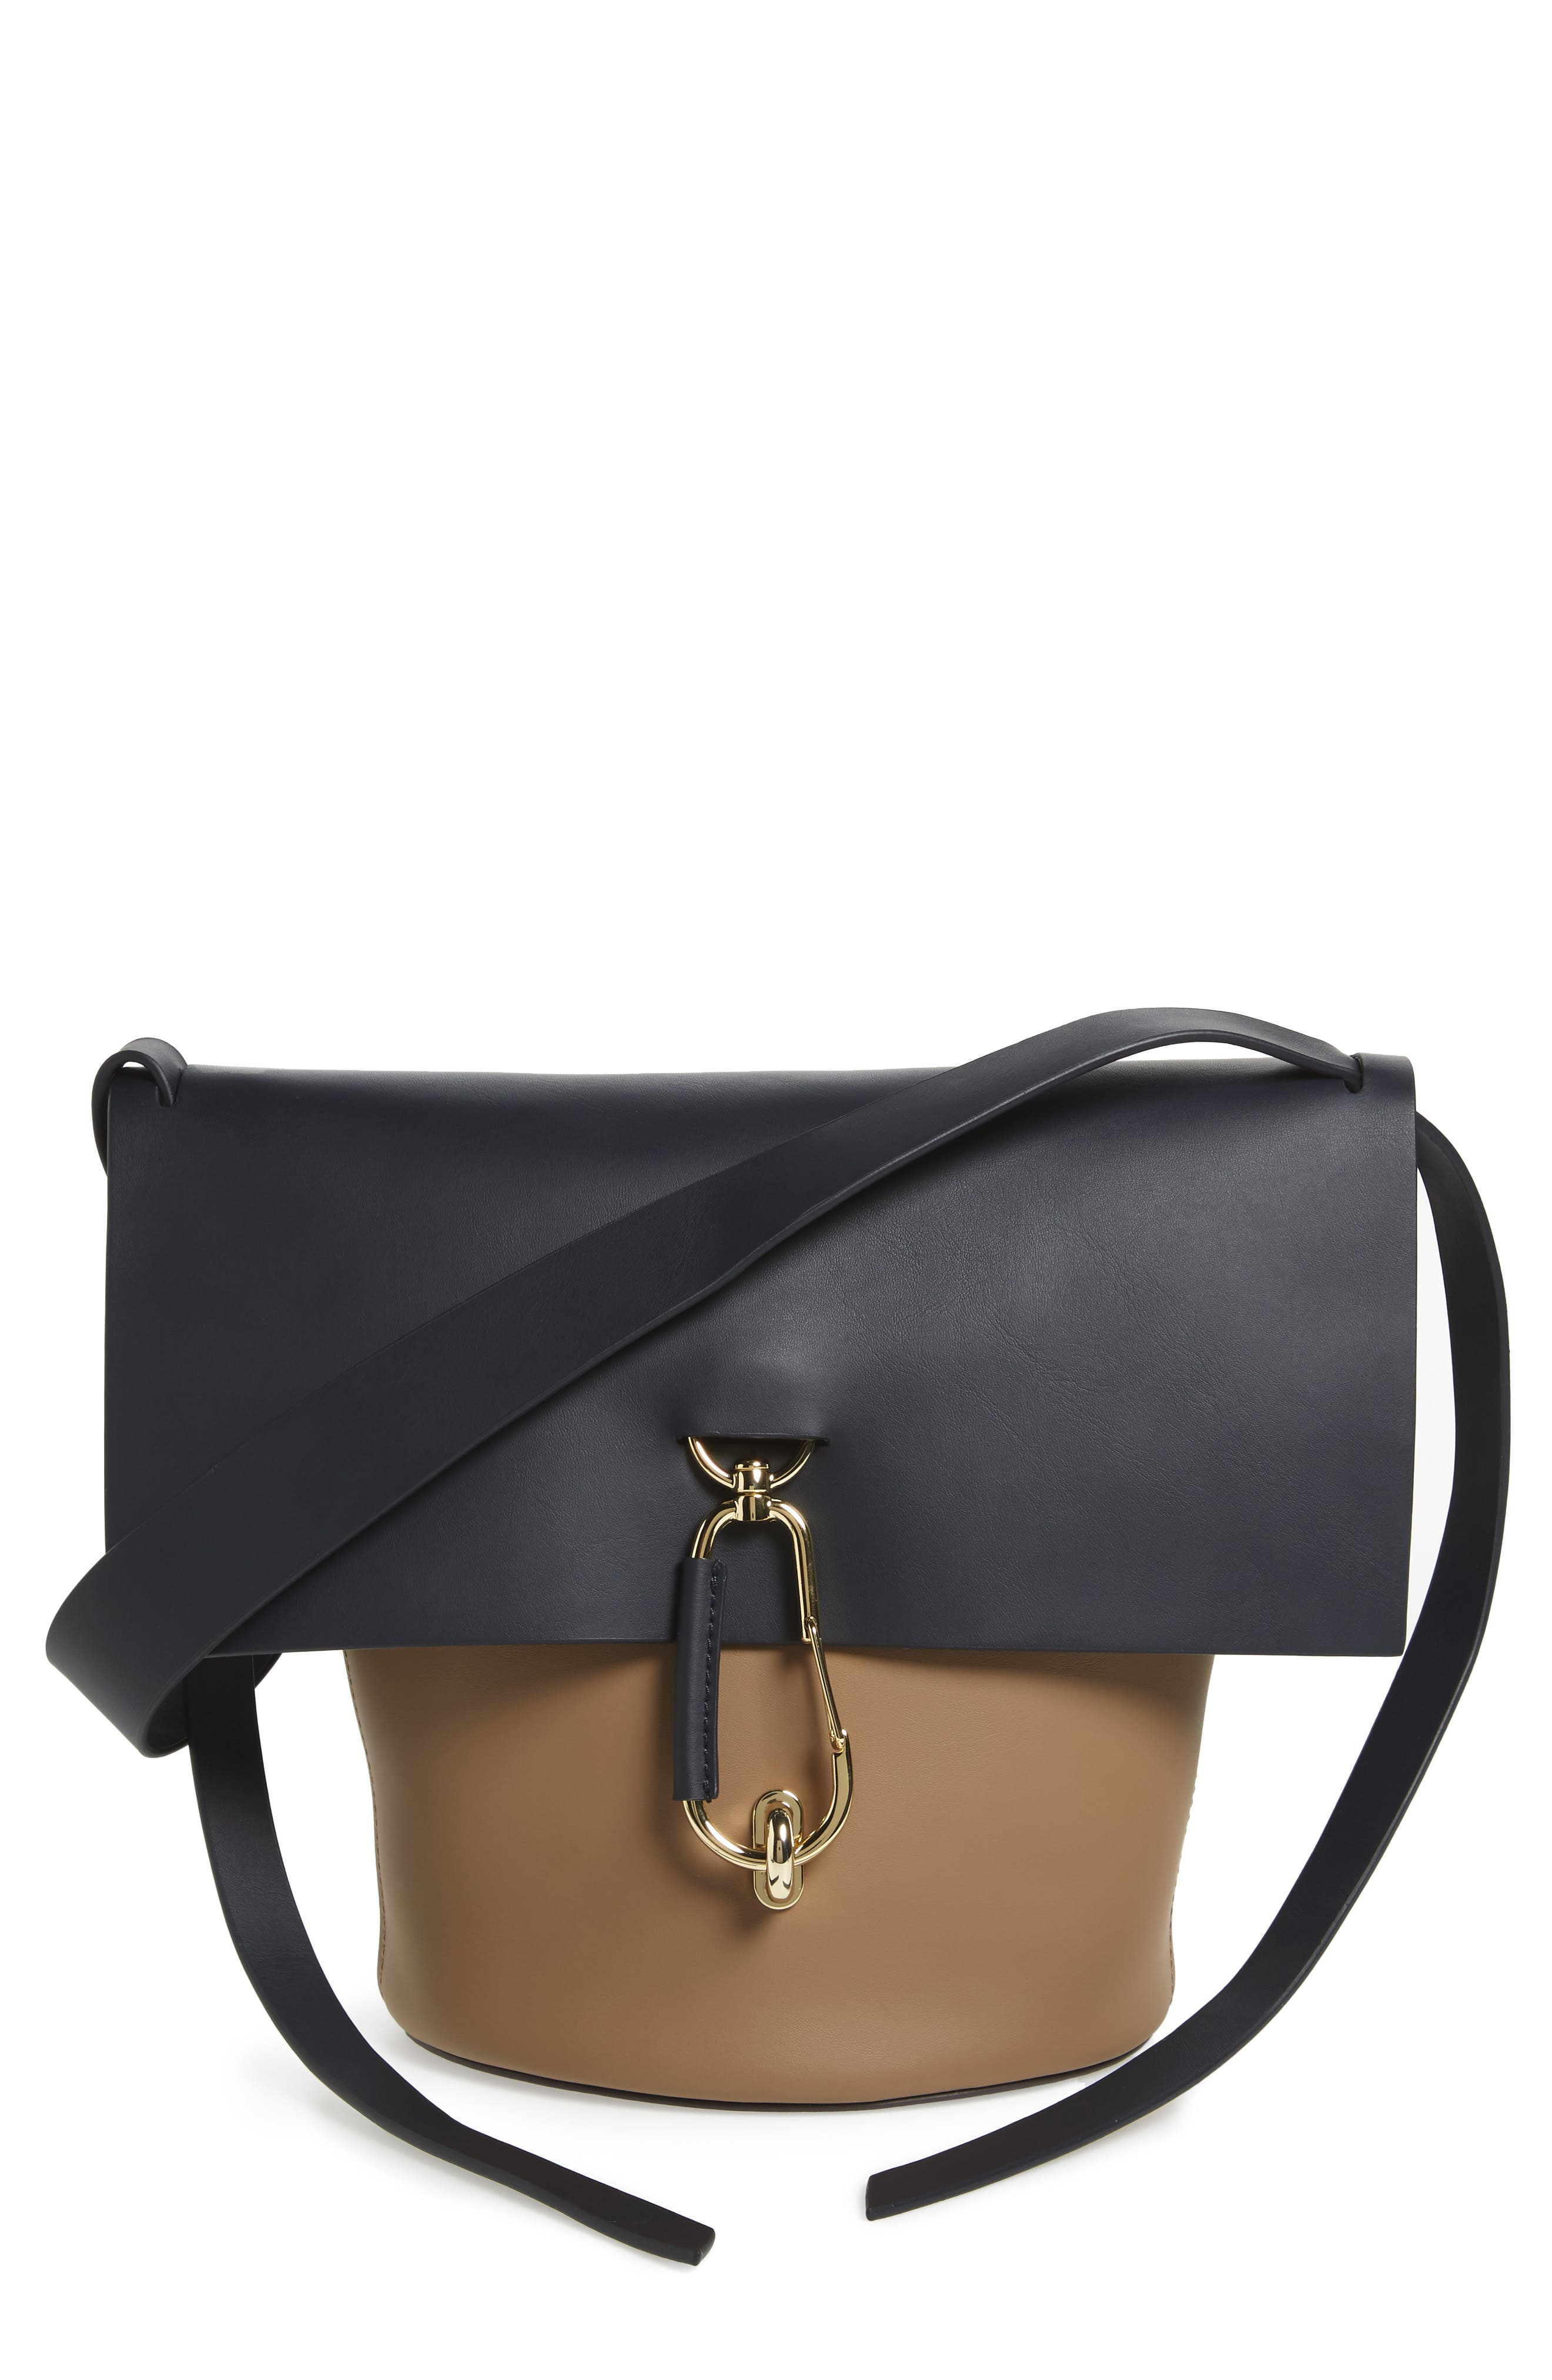 Belay Colorblock Calfskin Leather Bucket Bag,                         Main,                         color, Navy Color Block